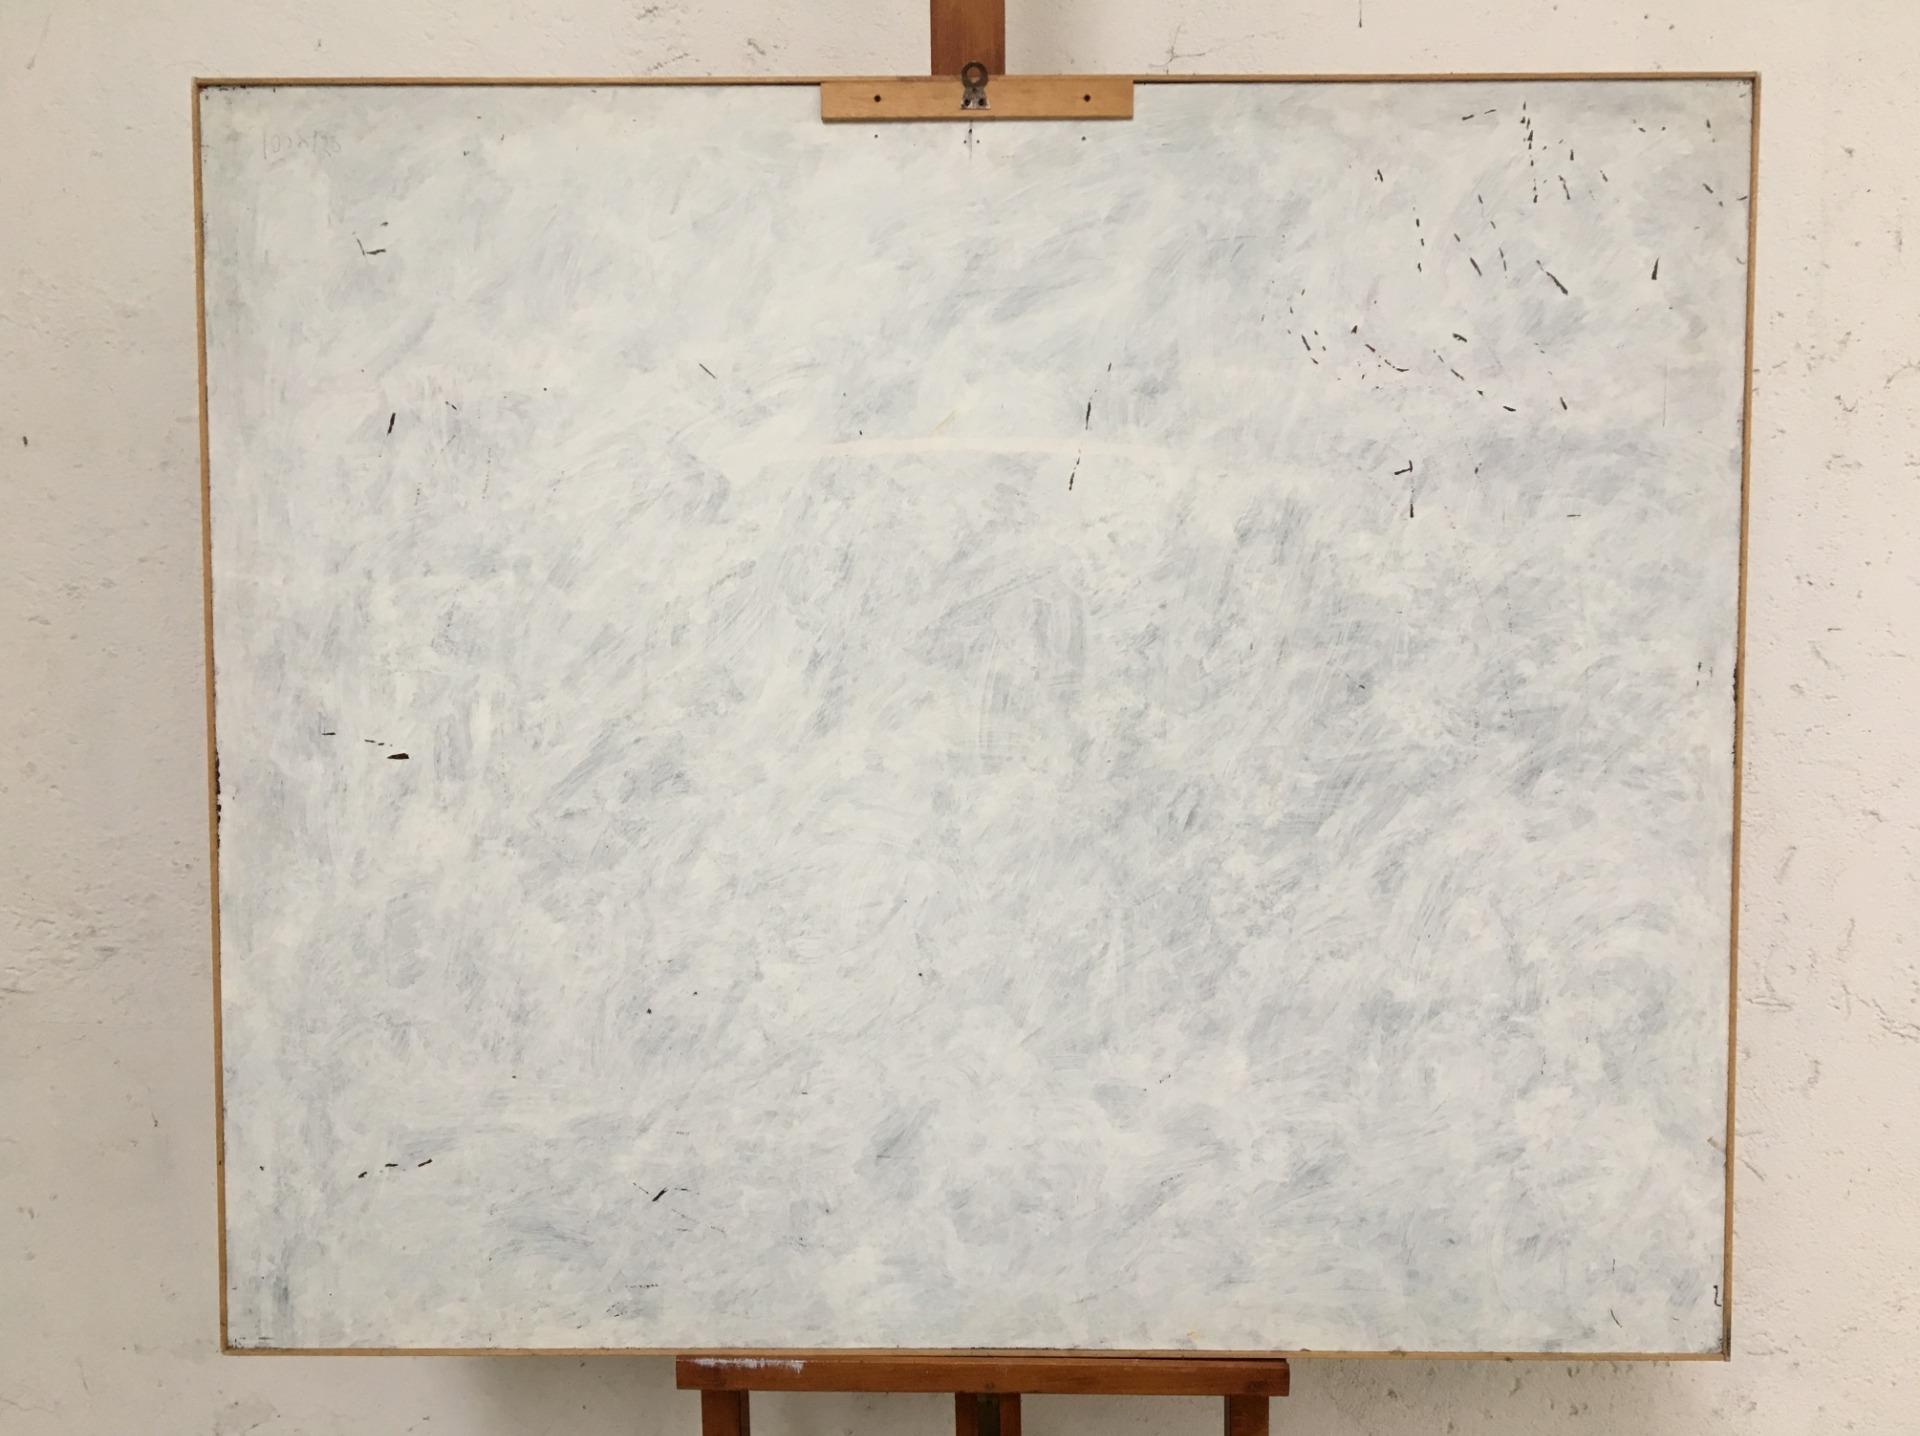 thumb10|G.L.BELLORINI NATURA MORTA 1